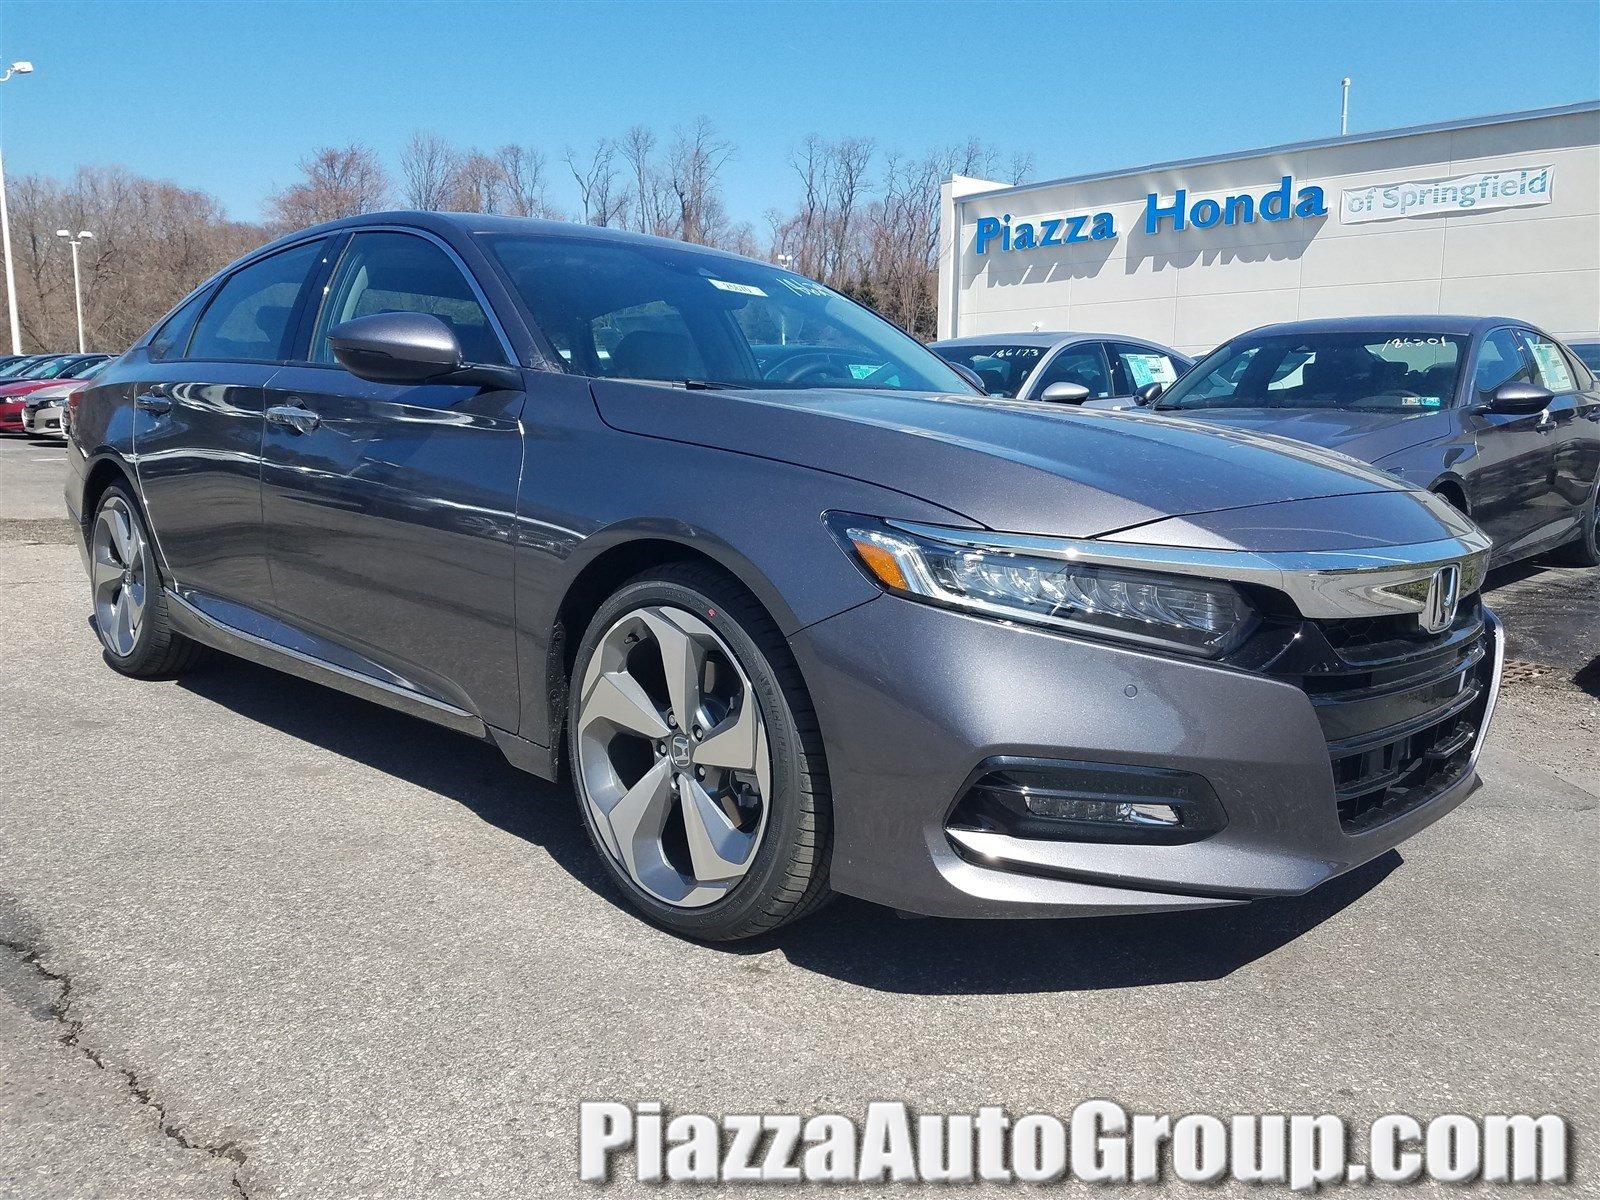 Used 2018 Honda Accord Sedan Touring 2.0T Touring 2.0T Auto Springfield, PA